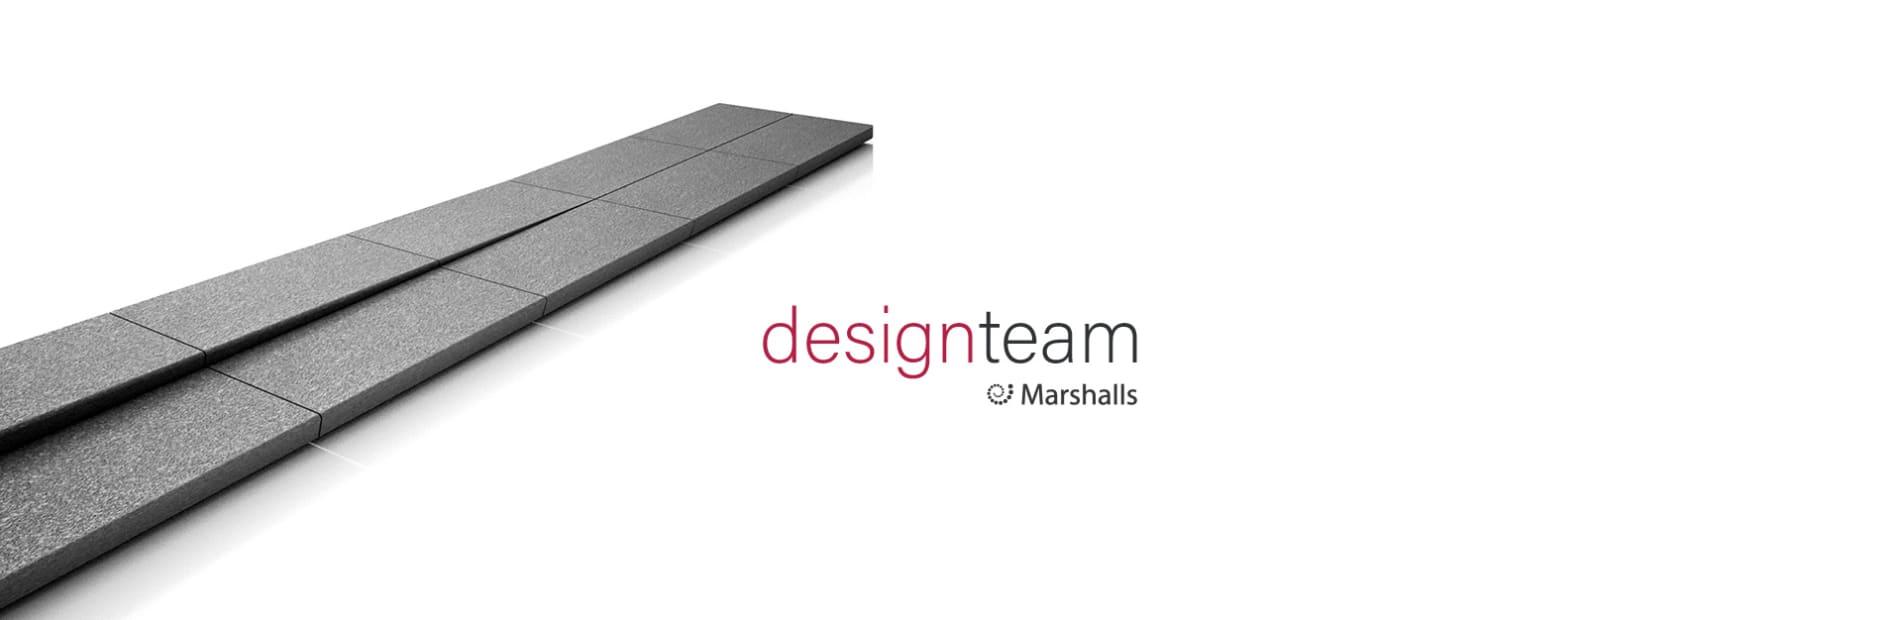 design team @ marshalls